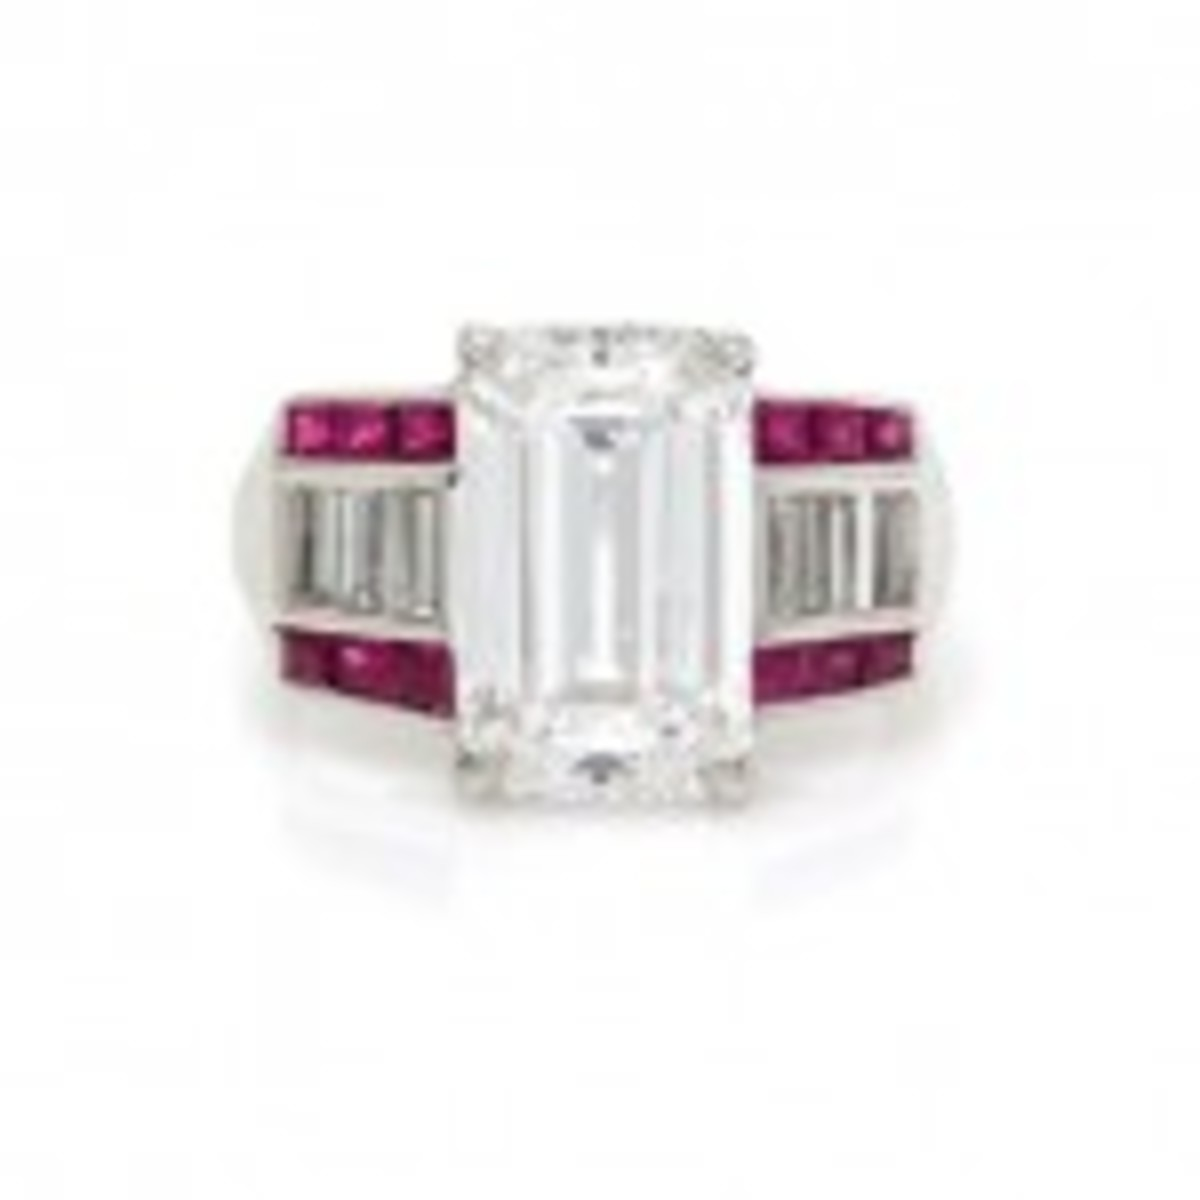 Golconda-type diamond and ruby ring